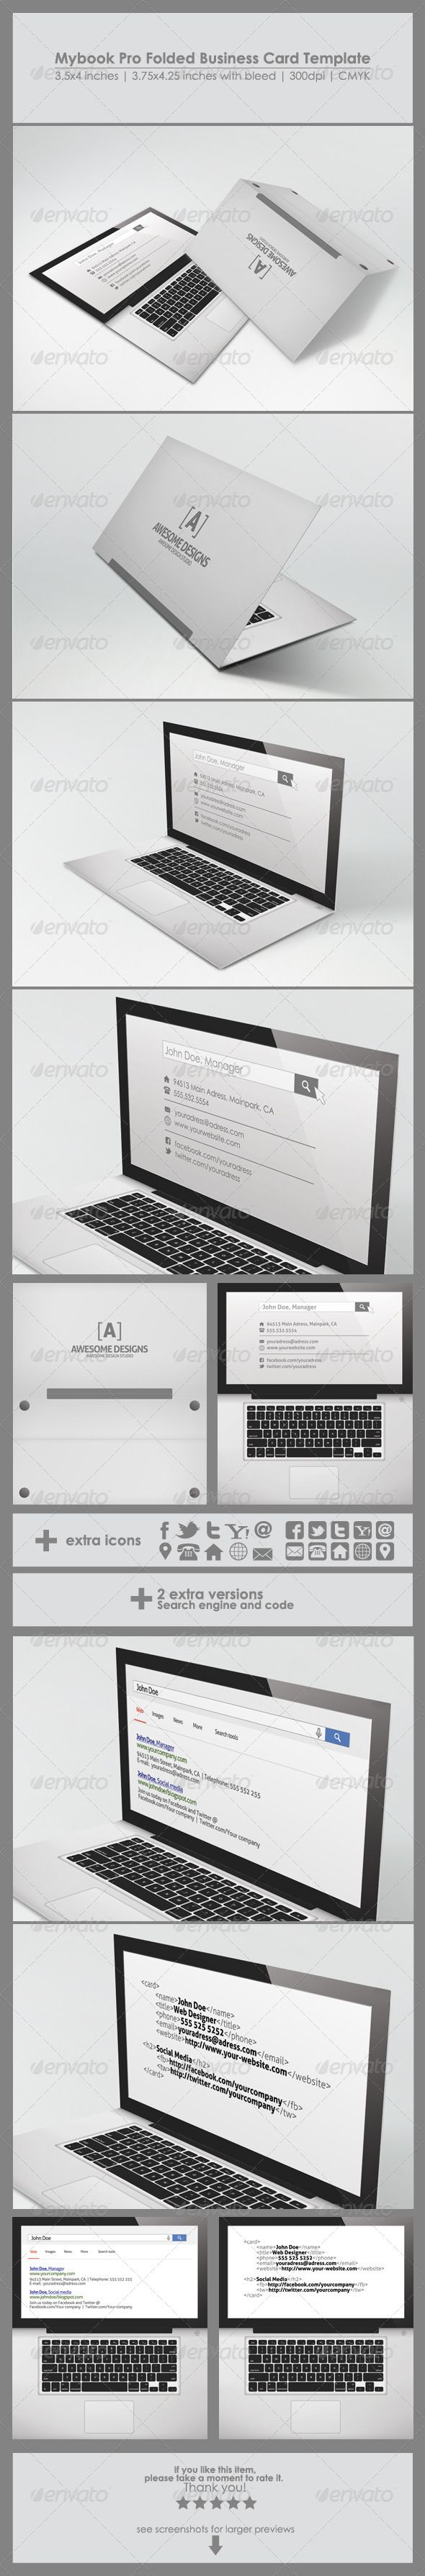 Mybook Pro Folded Business Card Template | Card templates ...